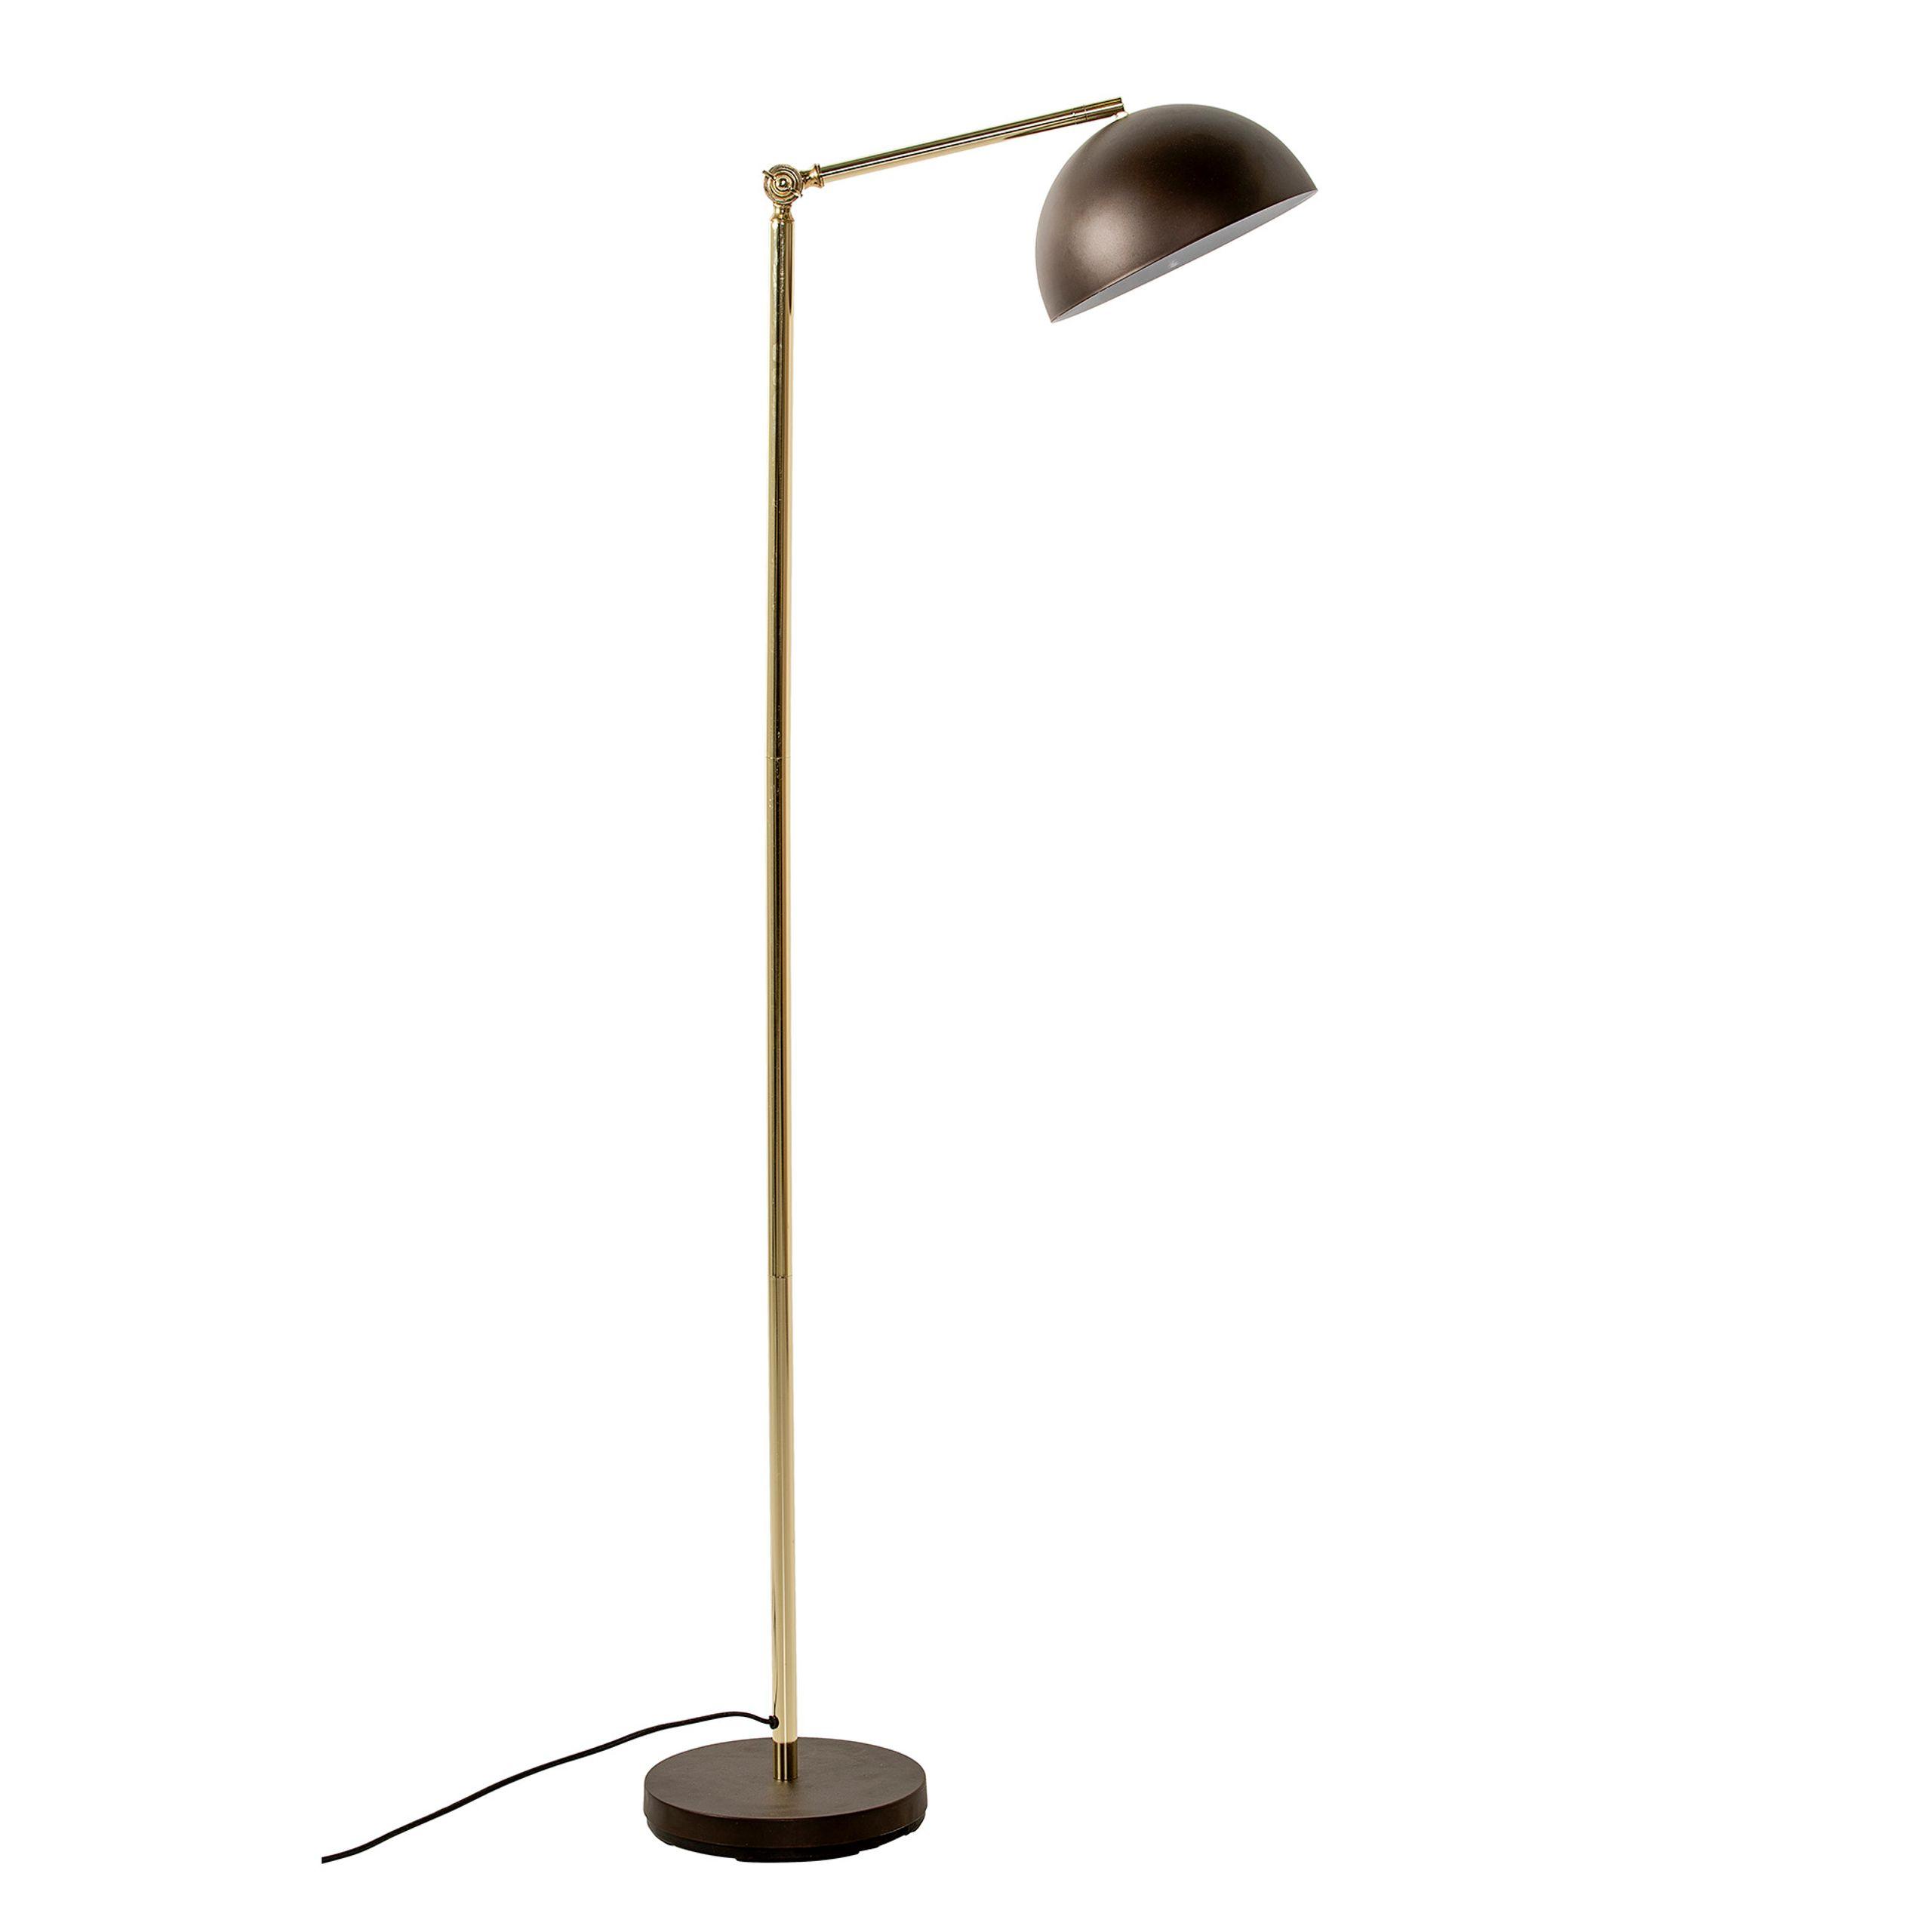 gulv lampe brun metal lampe bloomingville. Black Bedroom Furniture Sets. Home Design Ideas